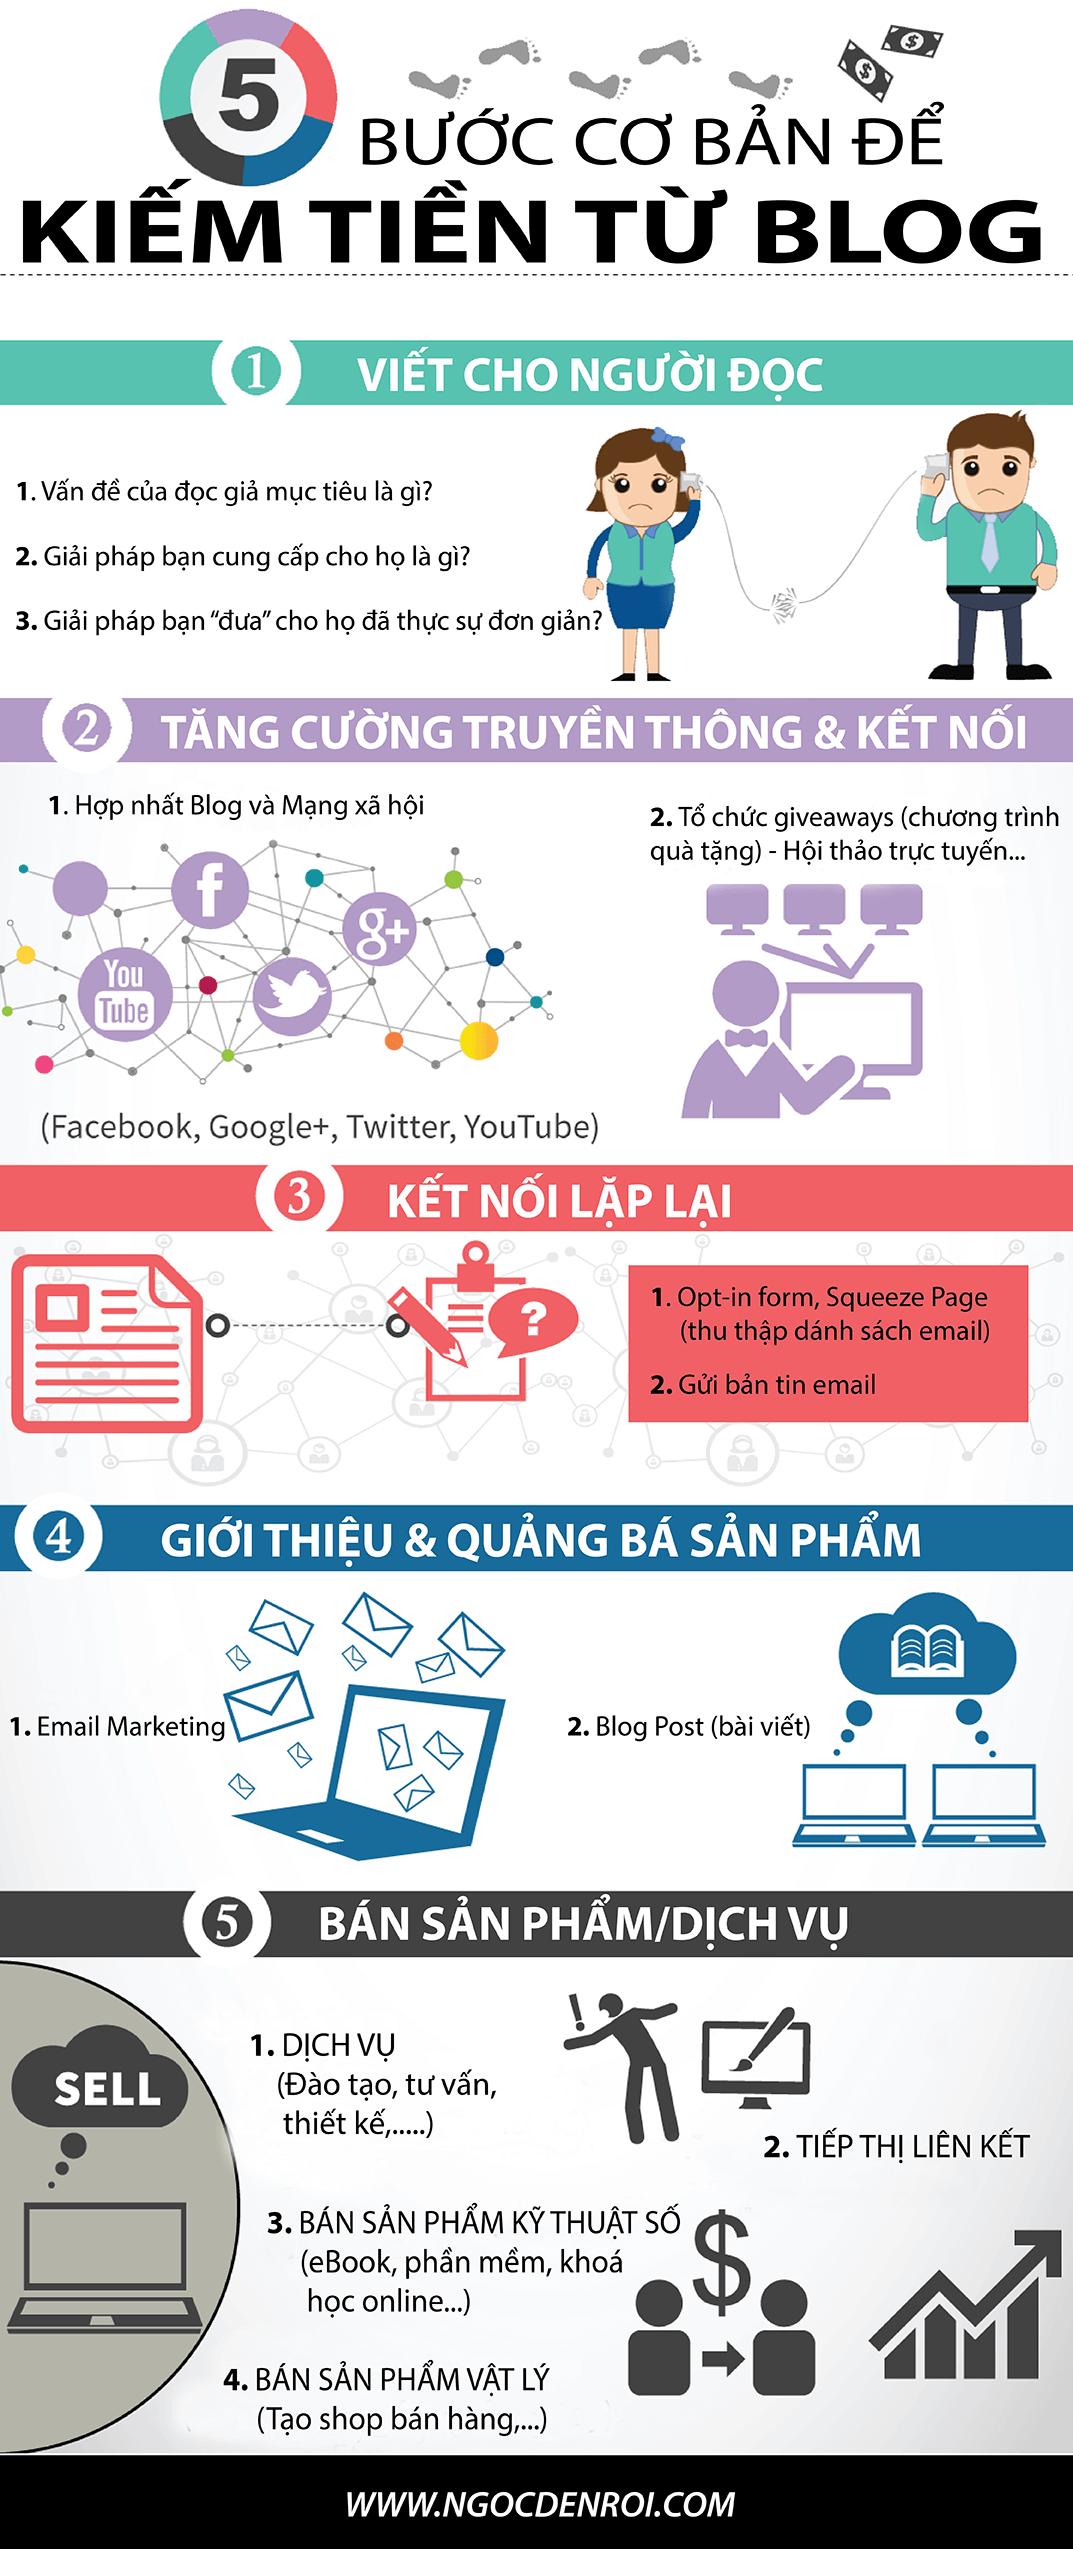 infographic 5 buoc kiem tien tu blog